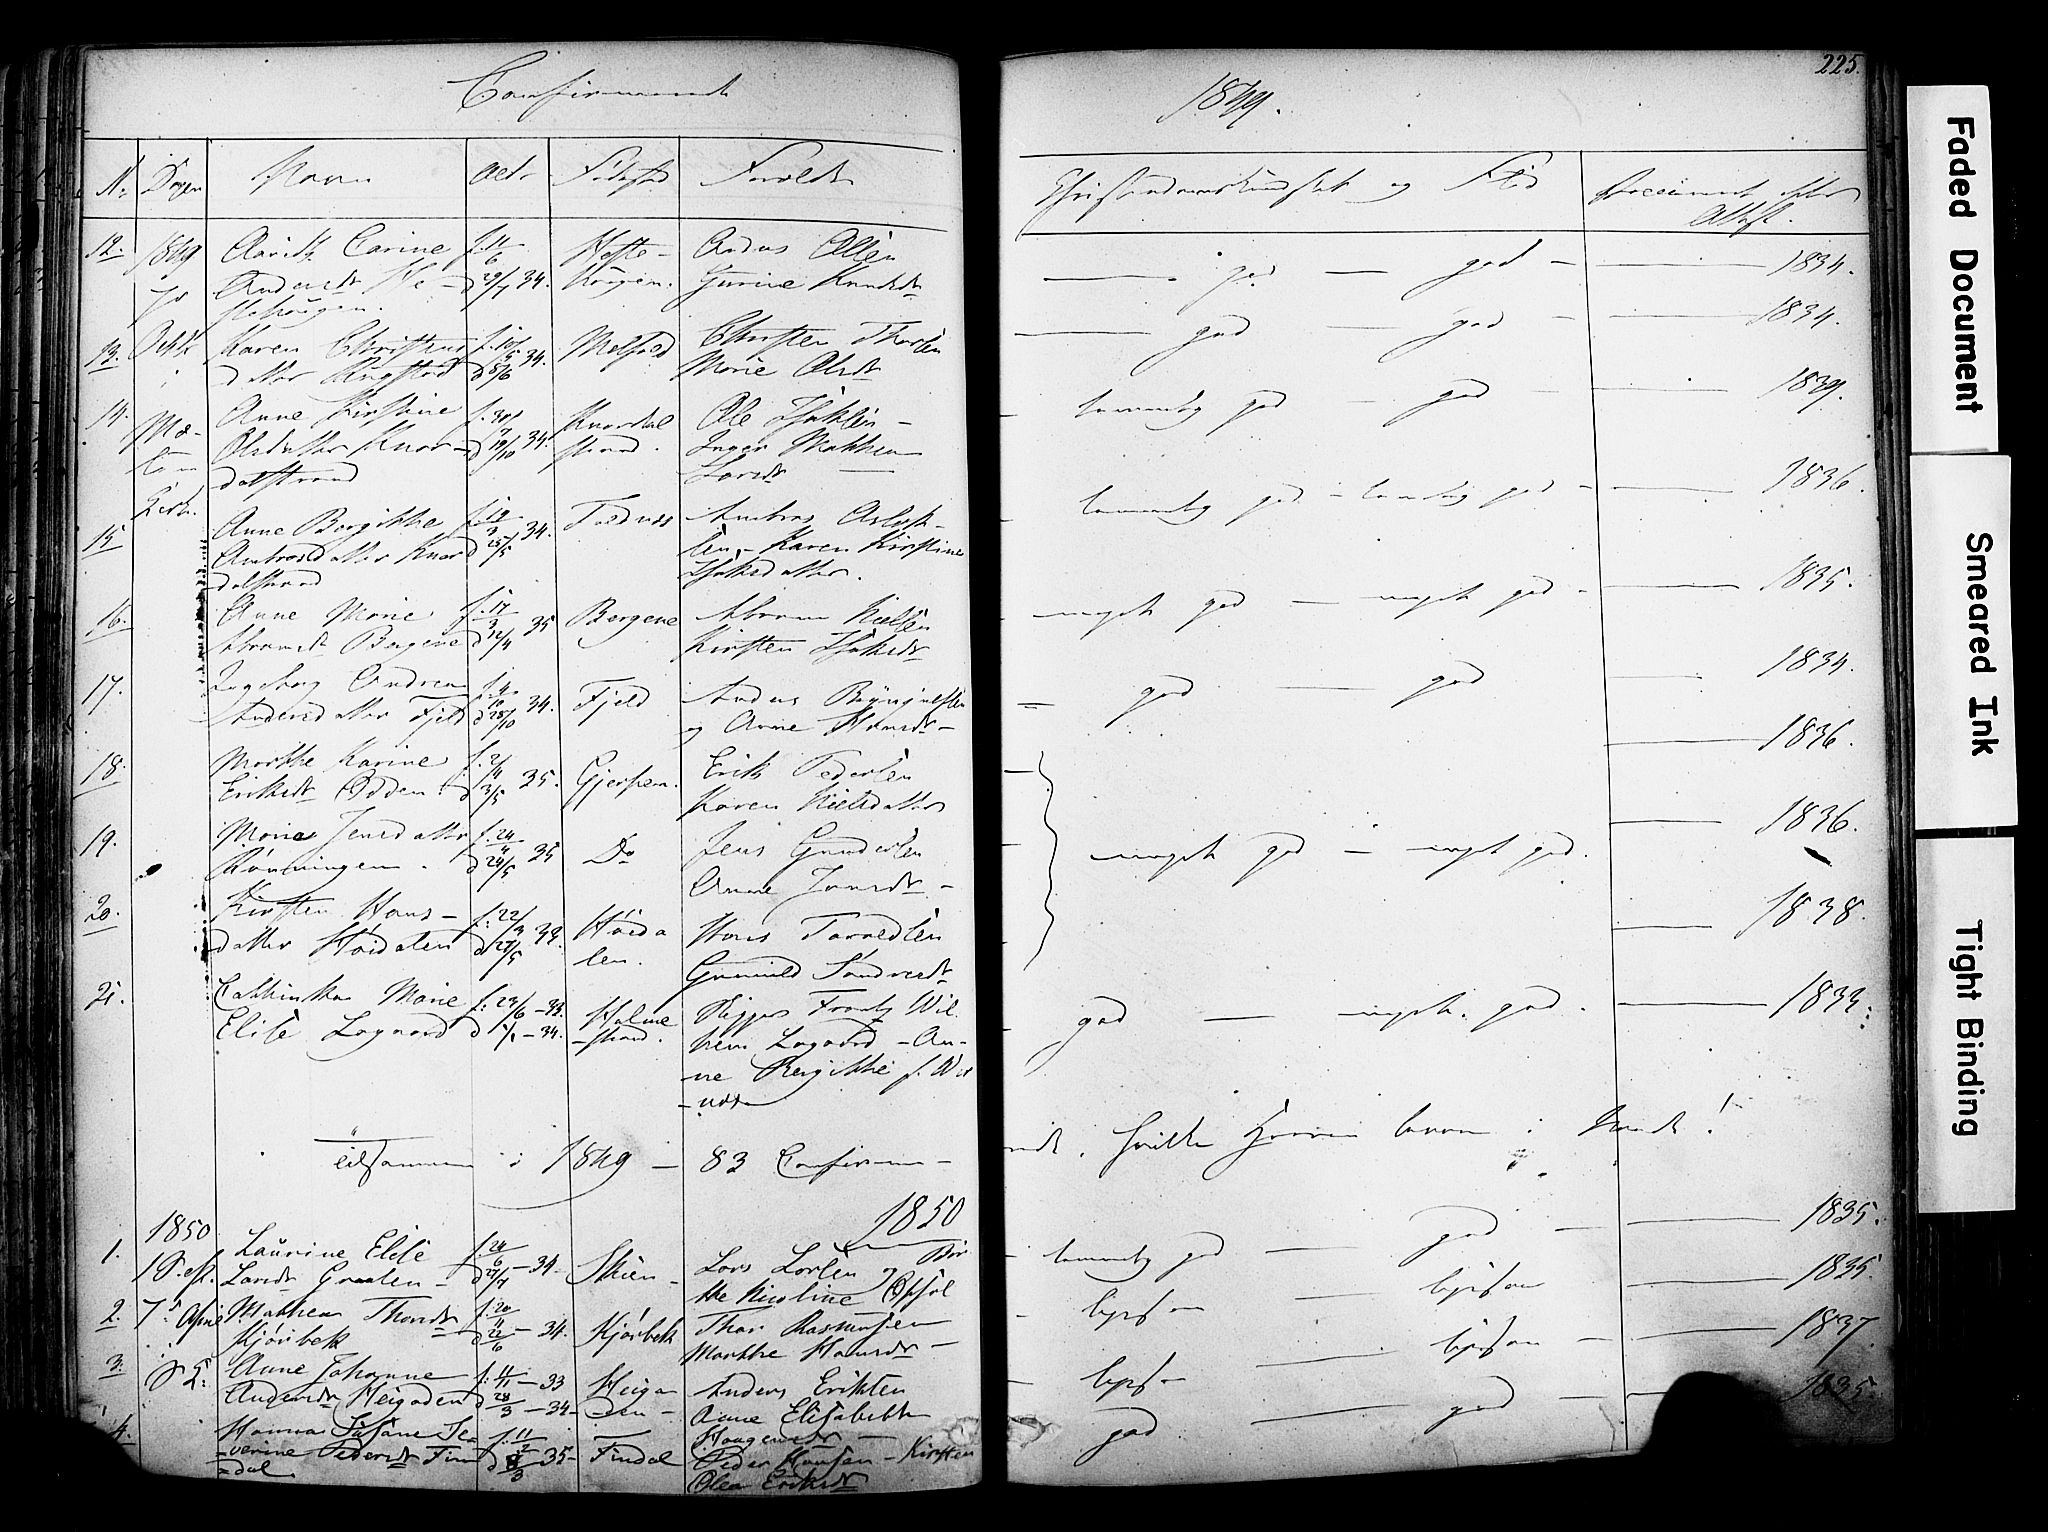 SAKO, Solum kirkebøker, F/Fa/L0006: Ministerialbok nr. I 6, 1844-1855, s. 225